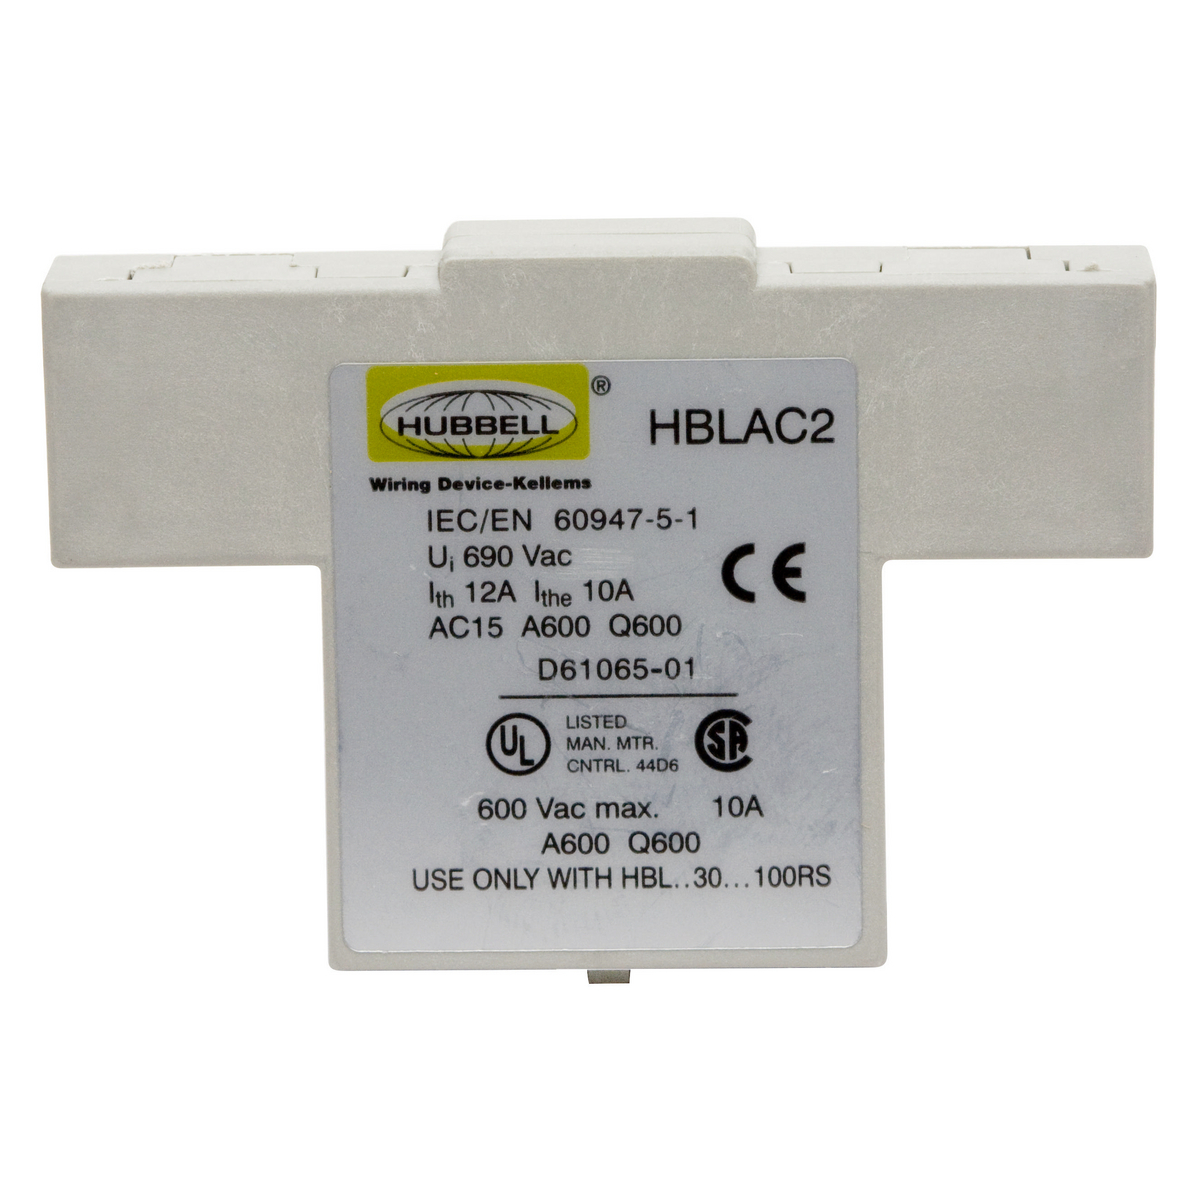 Hblac2 Brand Wiring Device Kellems